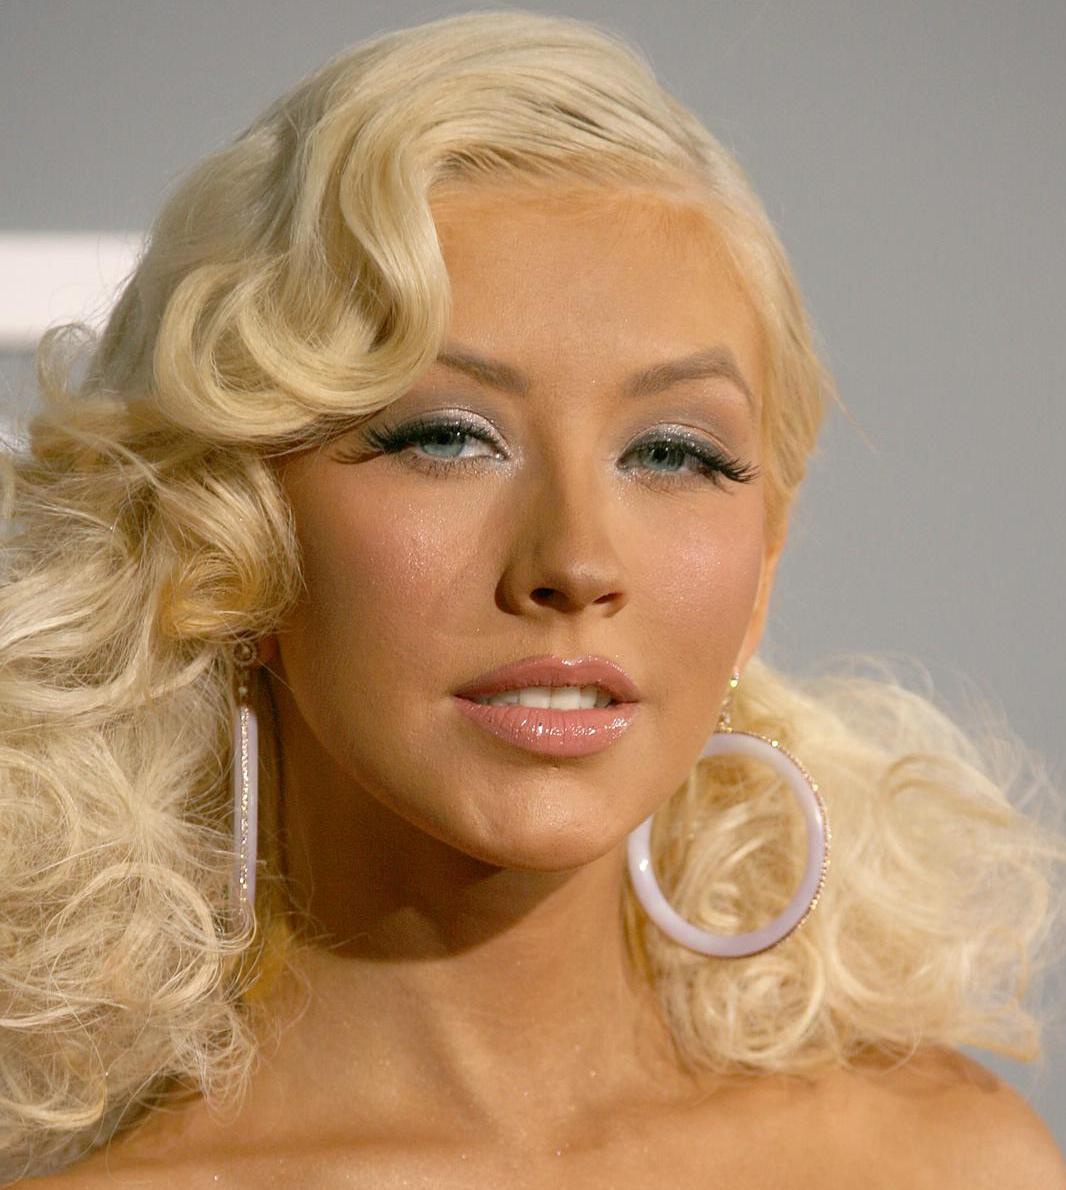 Christina Aguilera at the grammys !!2007